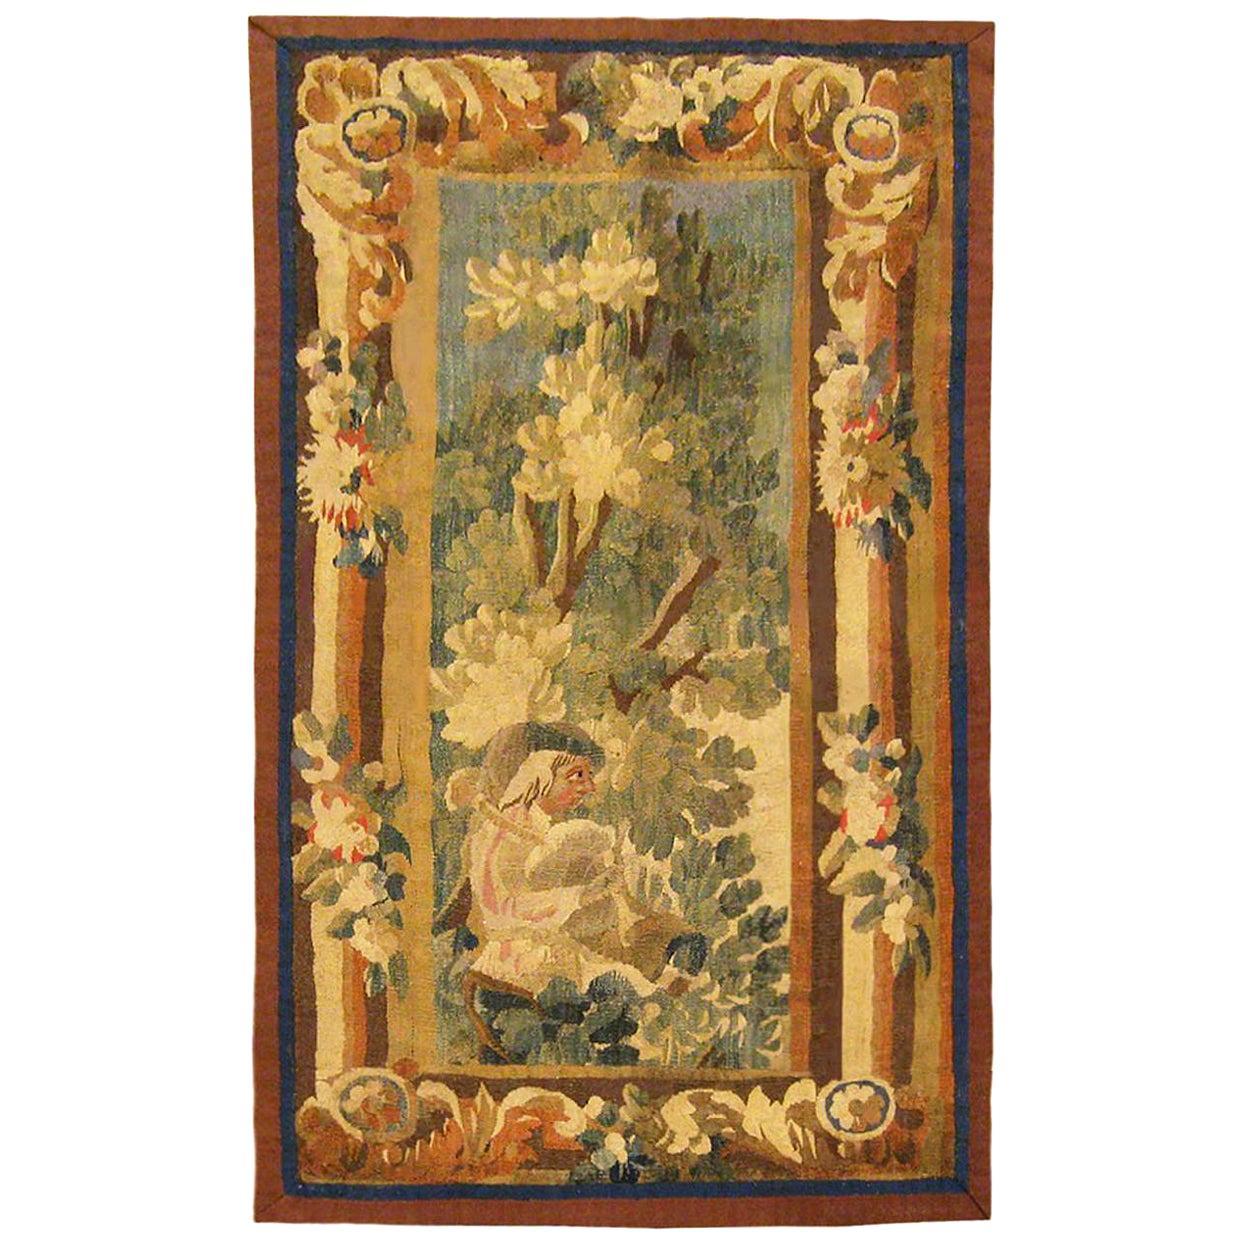 17th Century Flemish Pastoral Landscape Tapestry